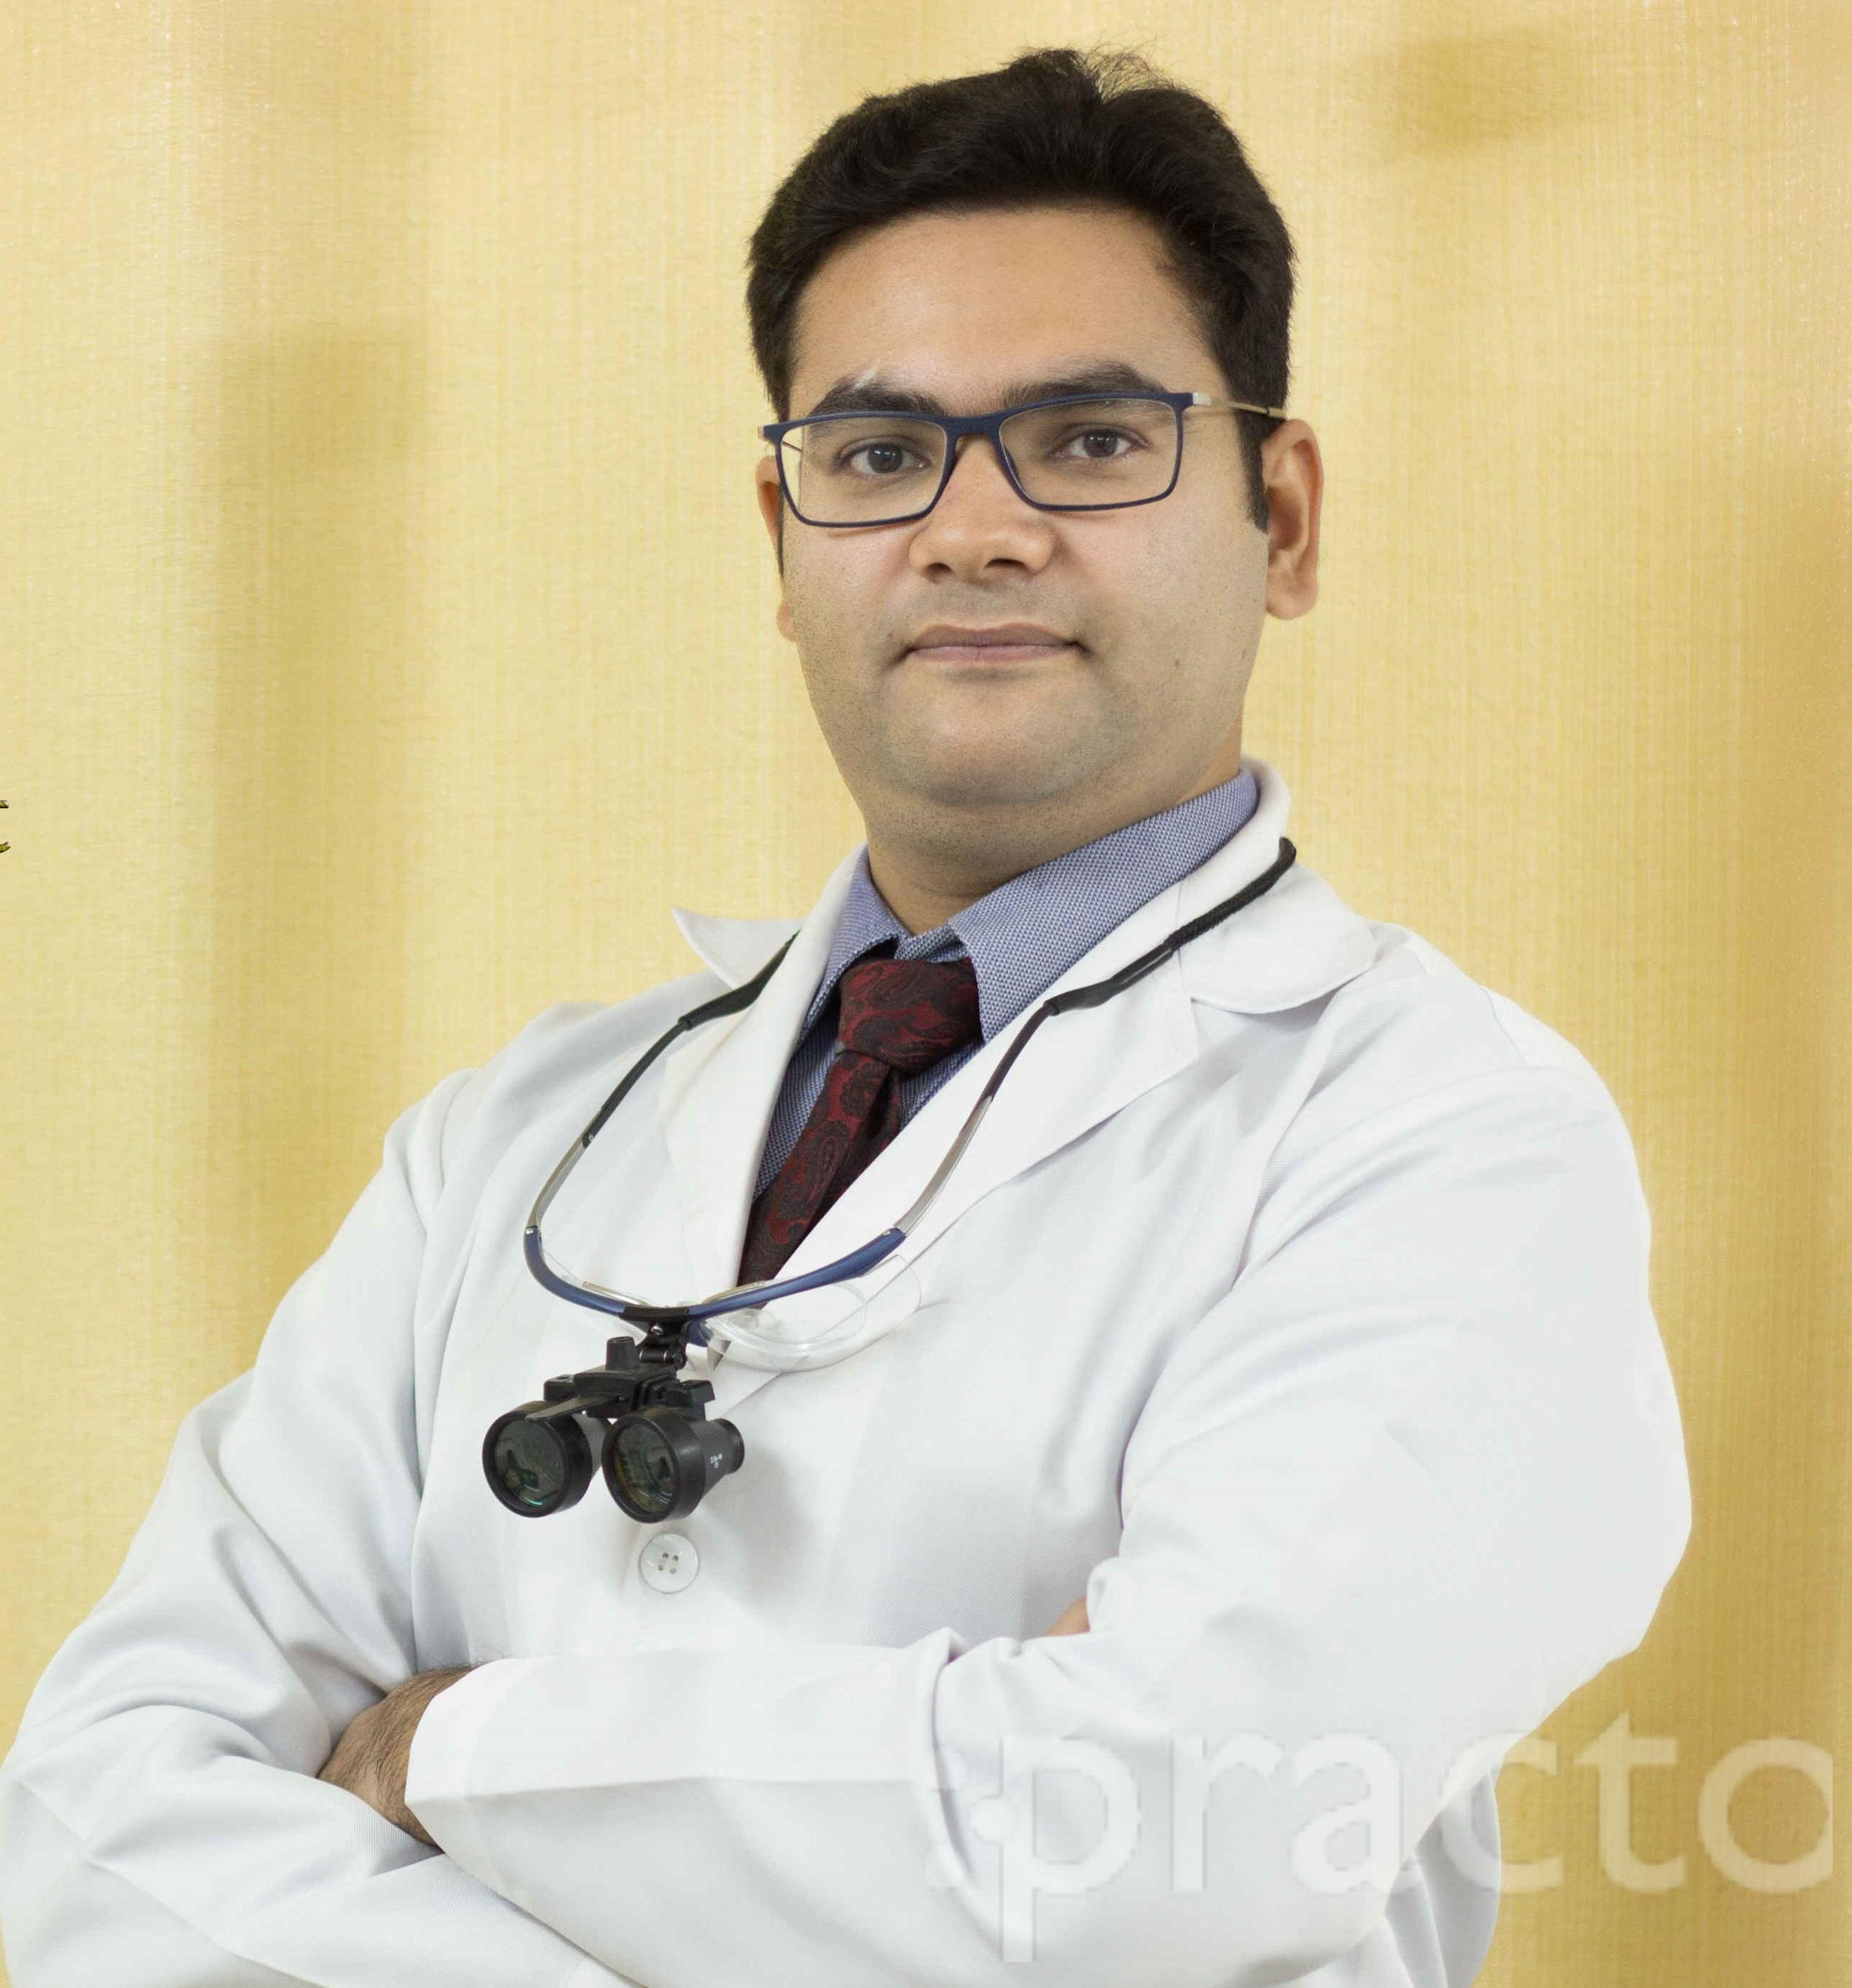 Dr. Vishwas Madan